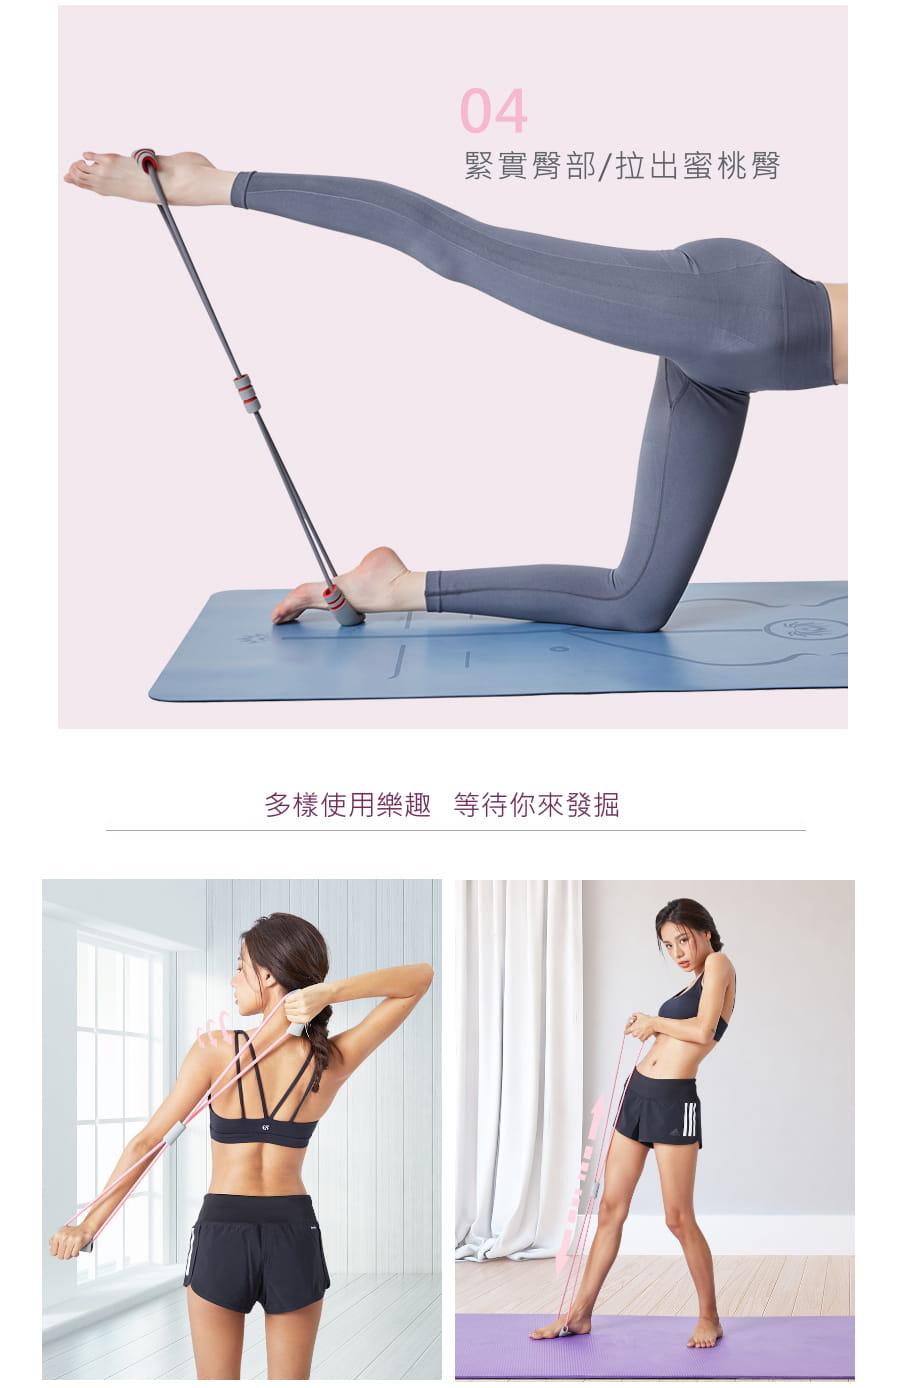 【Un-Sport高機能】Fitness Kit女力健身超值套組(8字拉力帶+瑜珈環) 3